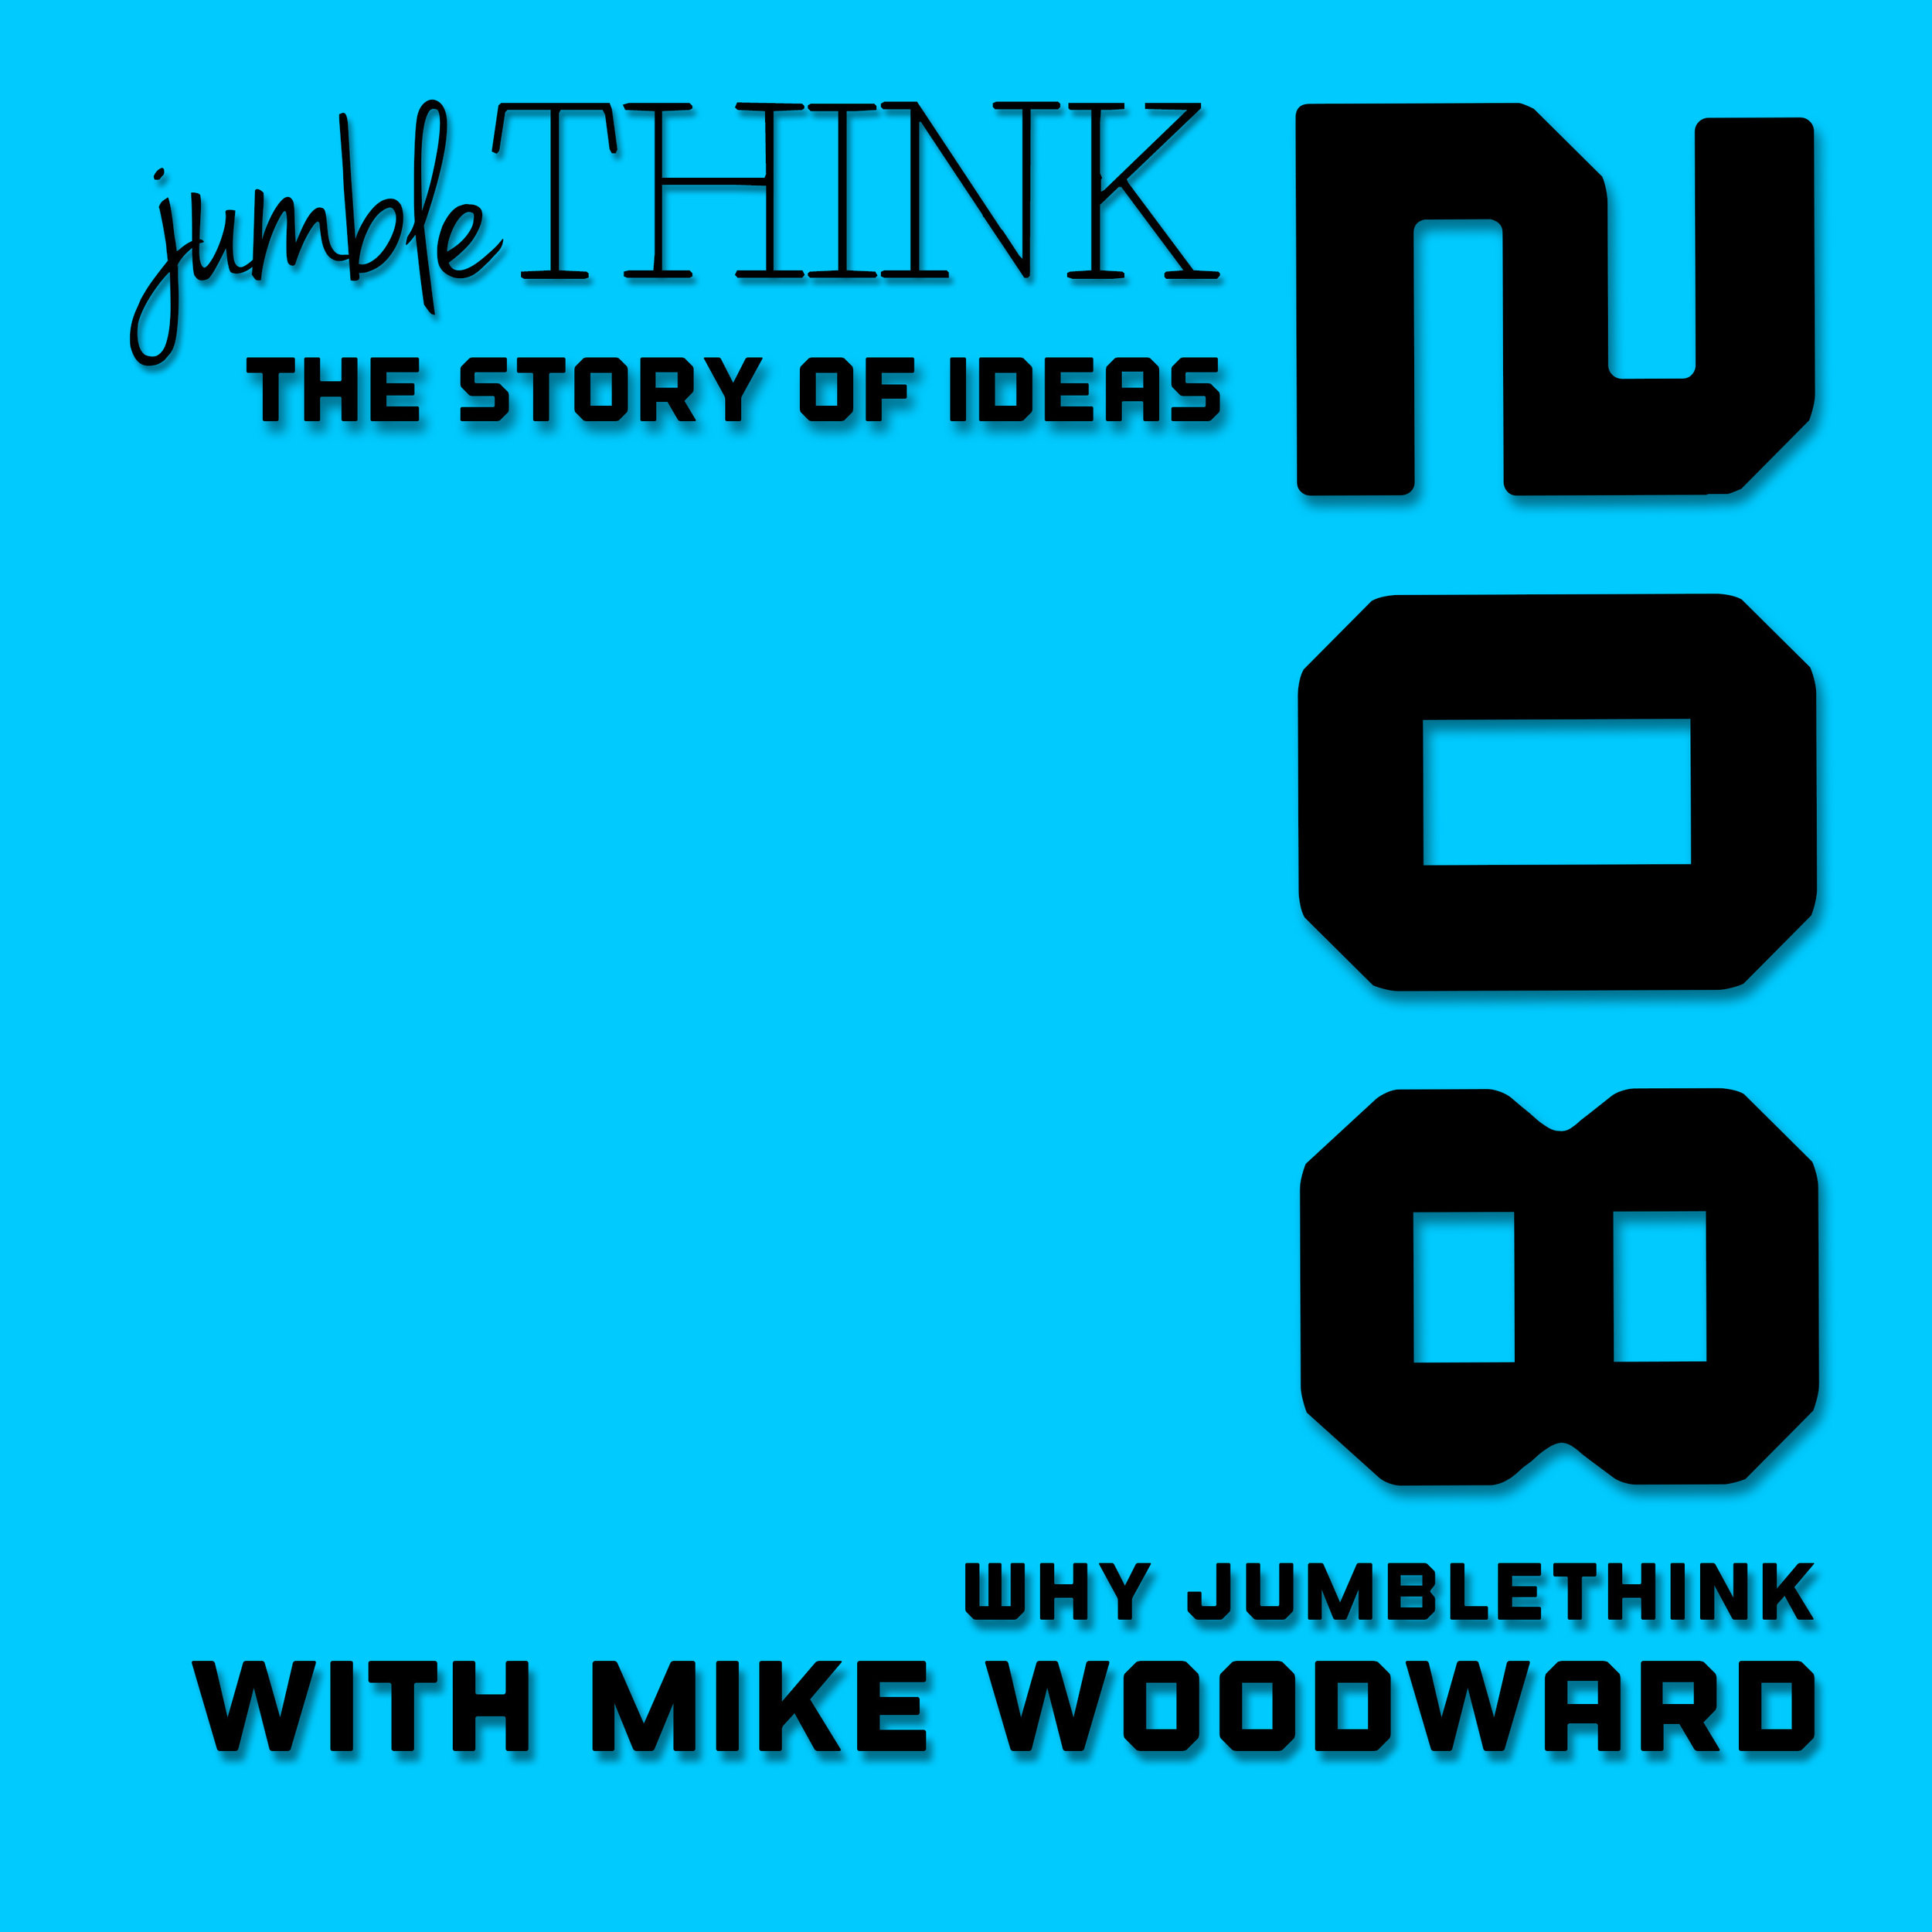 Why jumbleThink